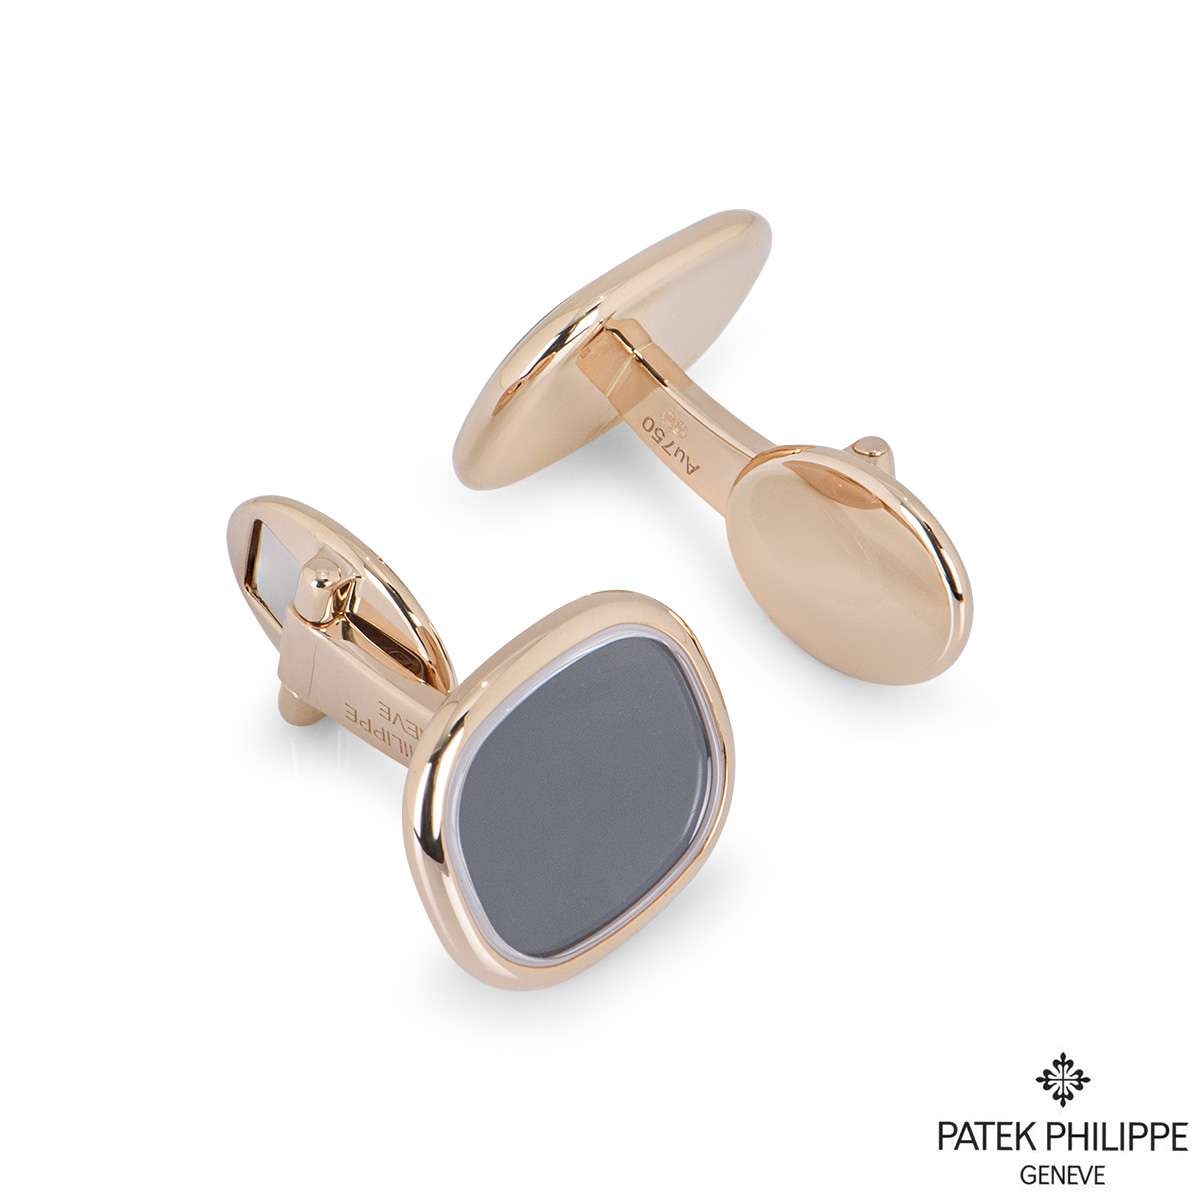 Patek Phillipe Rose Gold Ellipse Cufflinks 205.9102R5-010